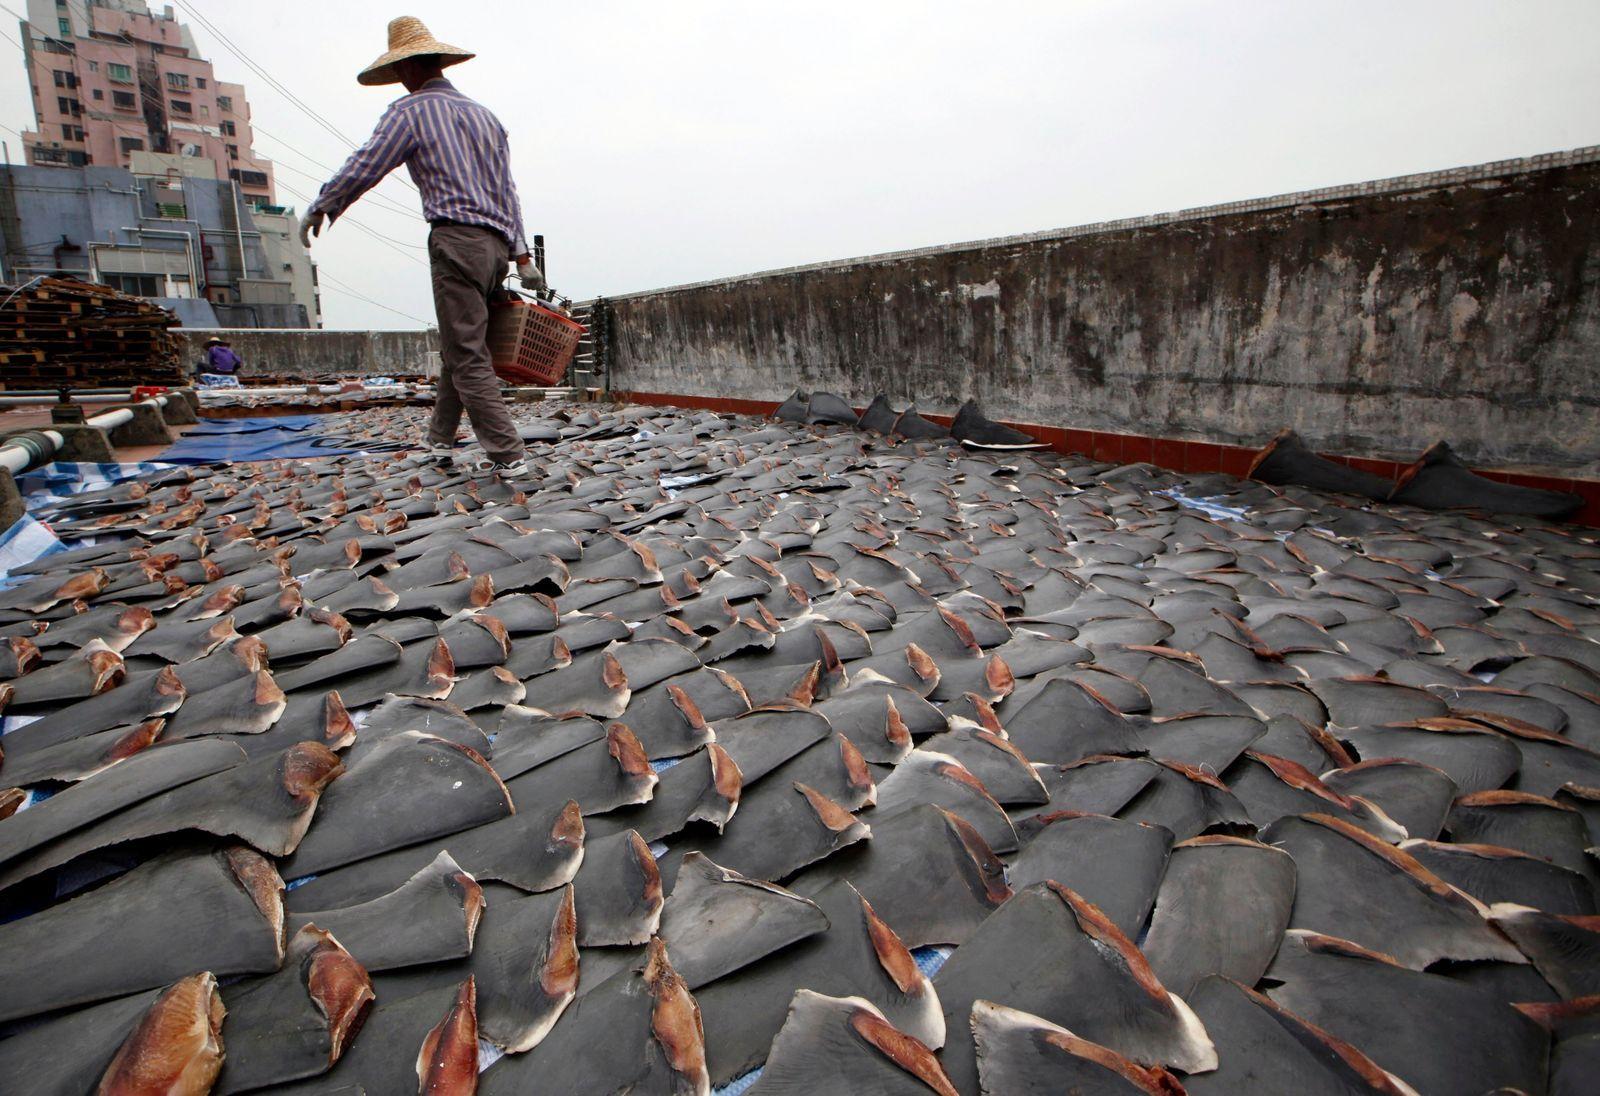 AP-อาหาร-จีน-หูฉลาม-สัตว์ทะเล-ตากแห้ง